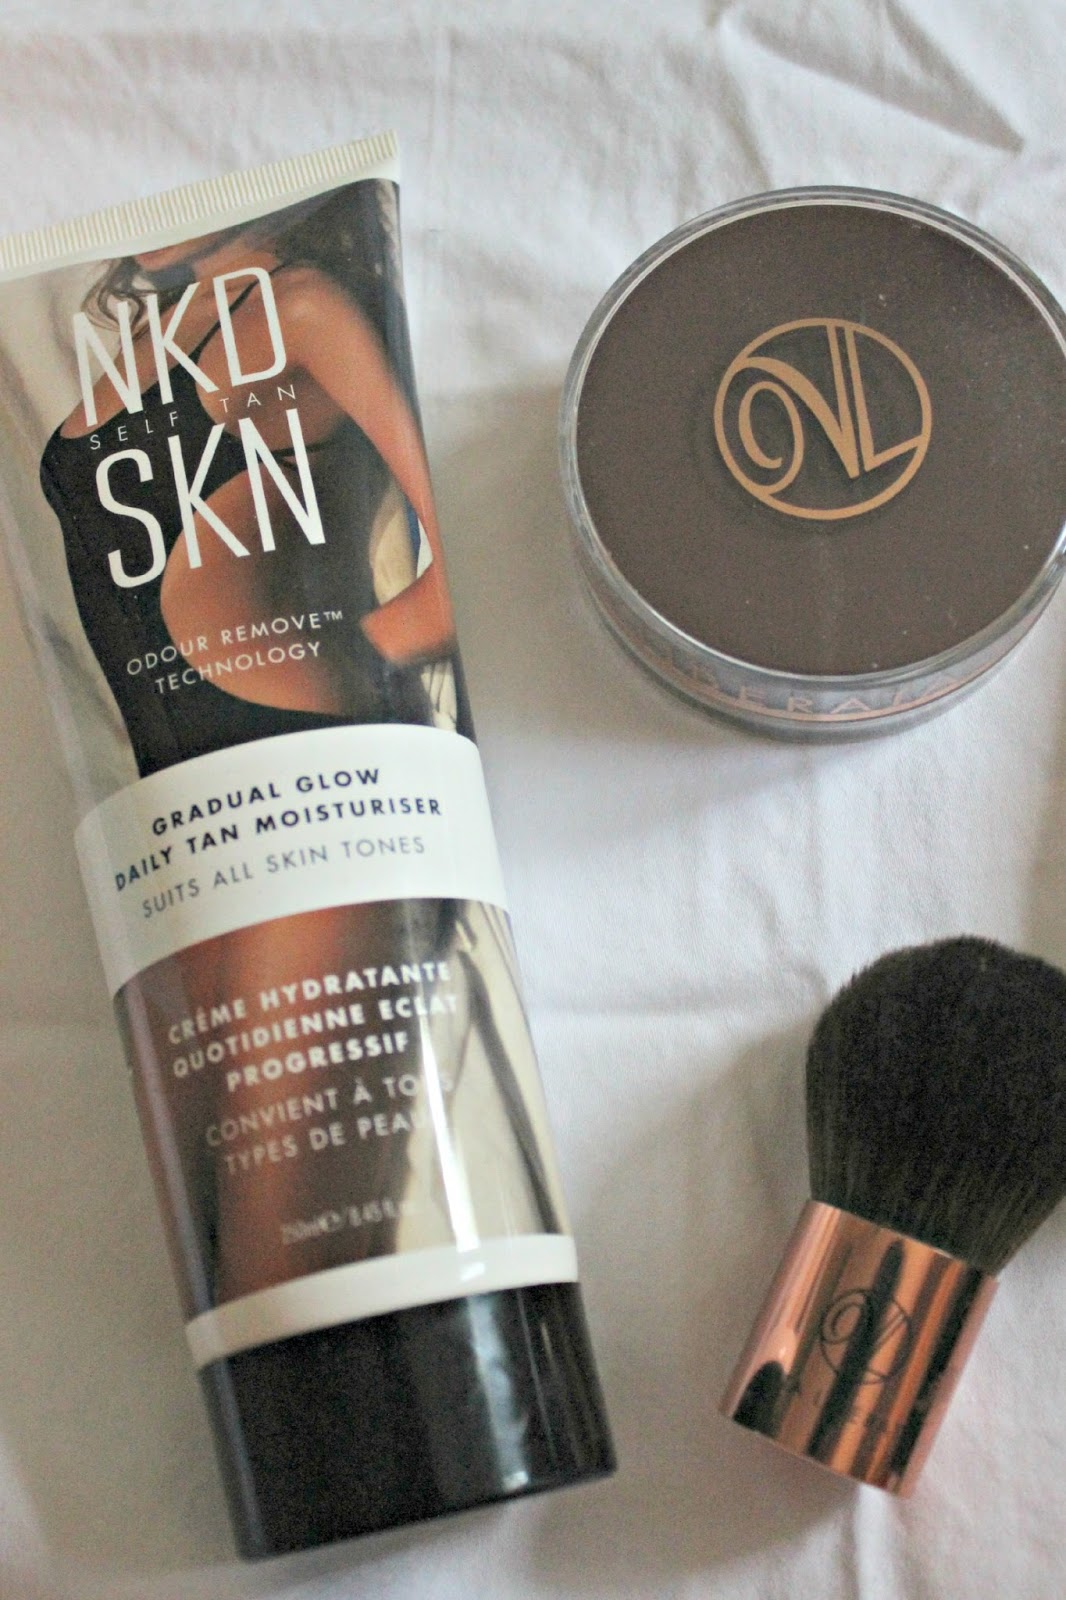 NKD SKN daily tan moisturizer